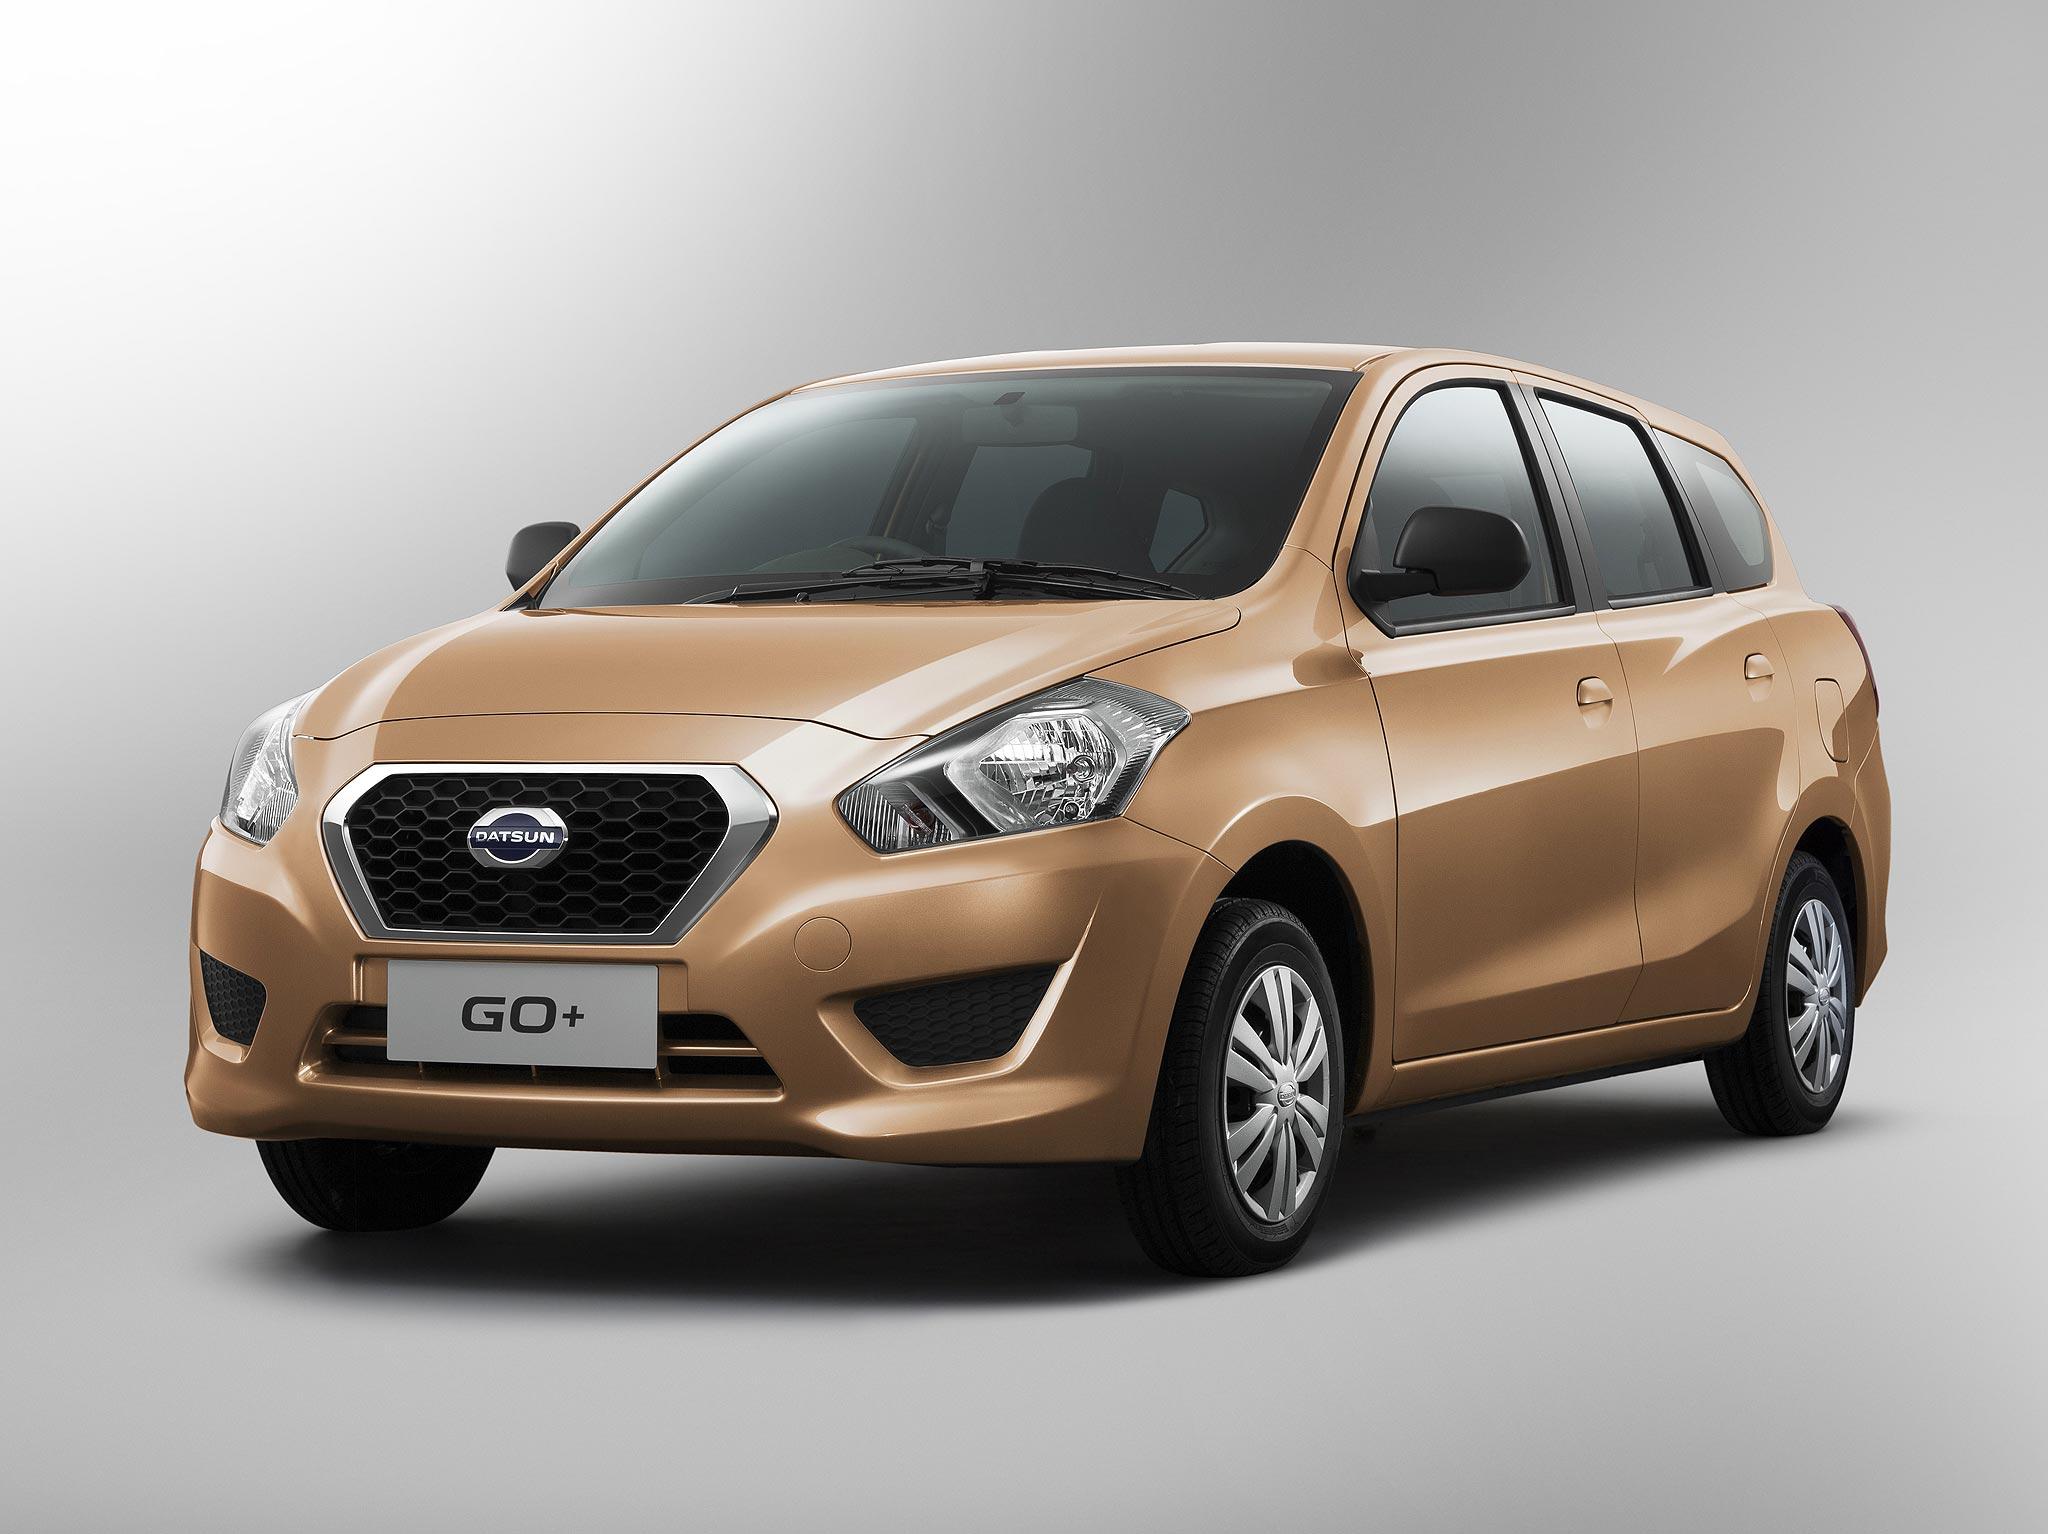 Datsun, Datsun GO+ Indonesia: Nih Gambar Datsun GO Plus High-Resolution